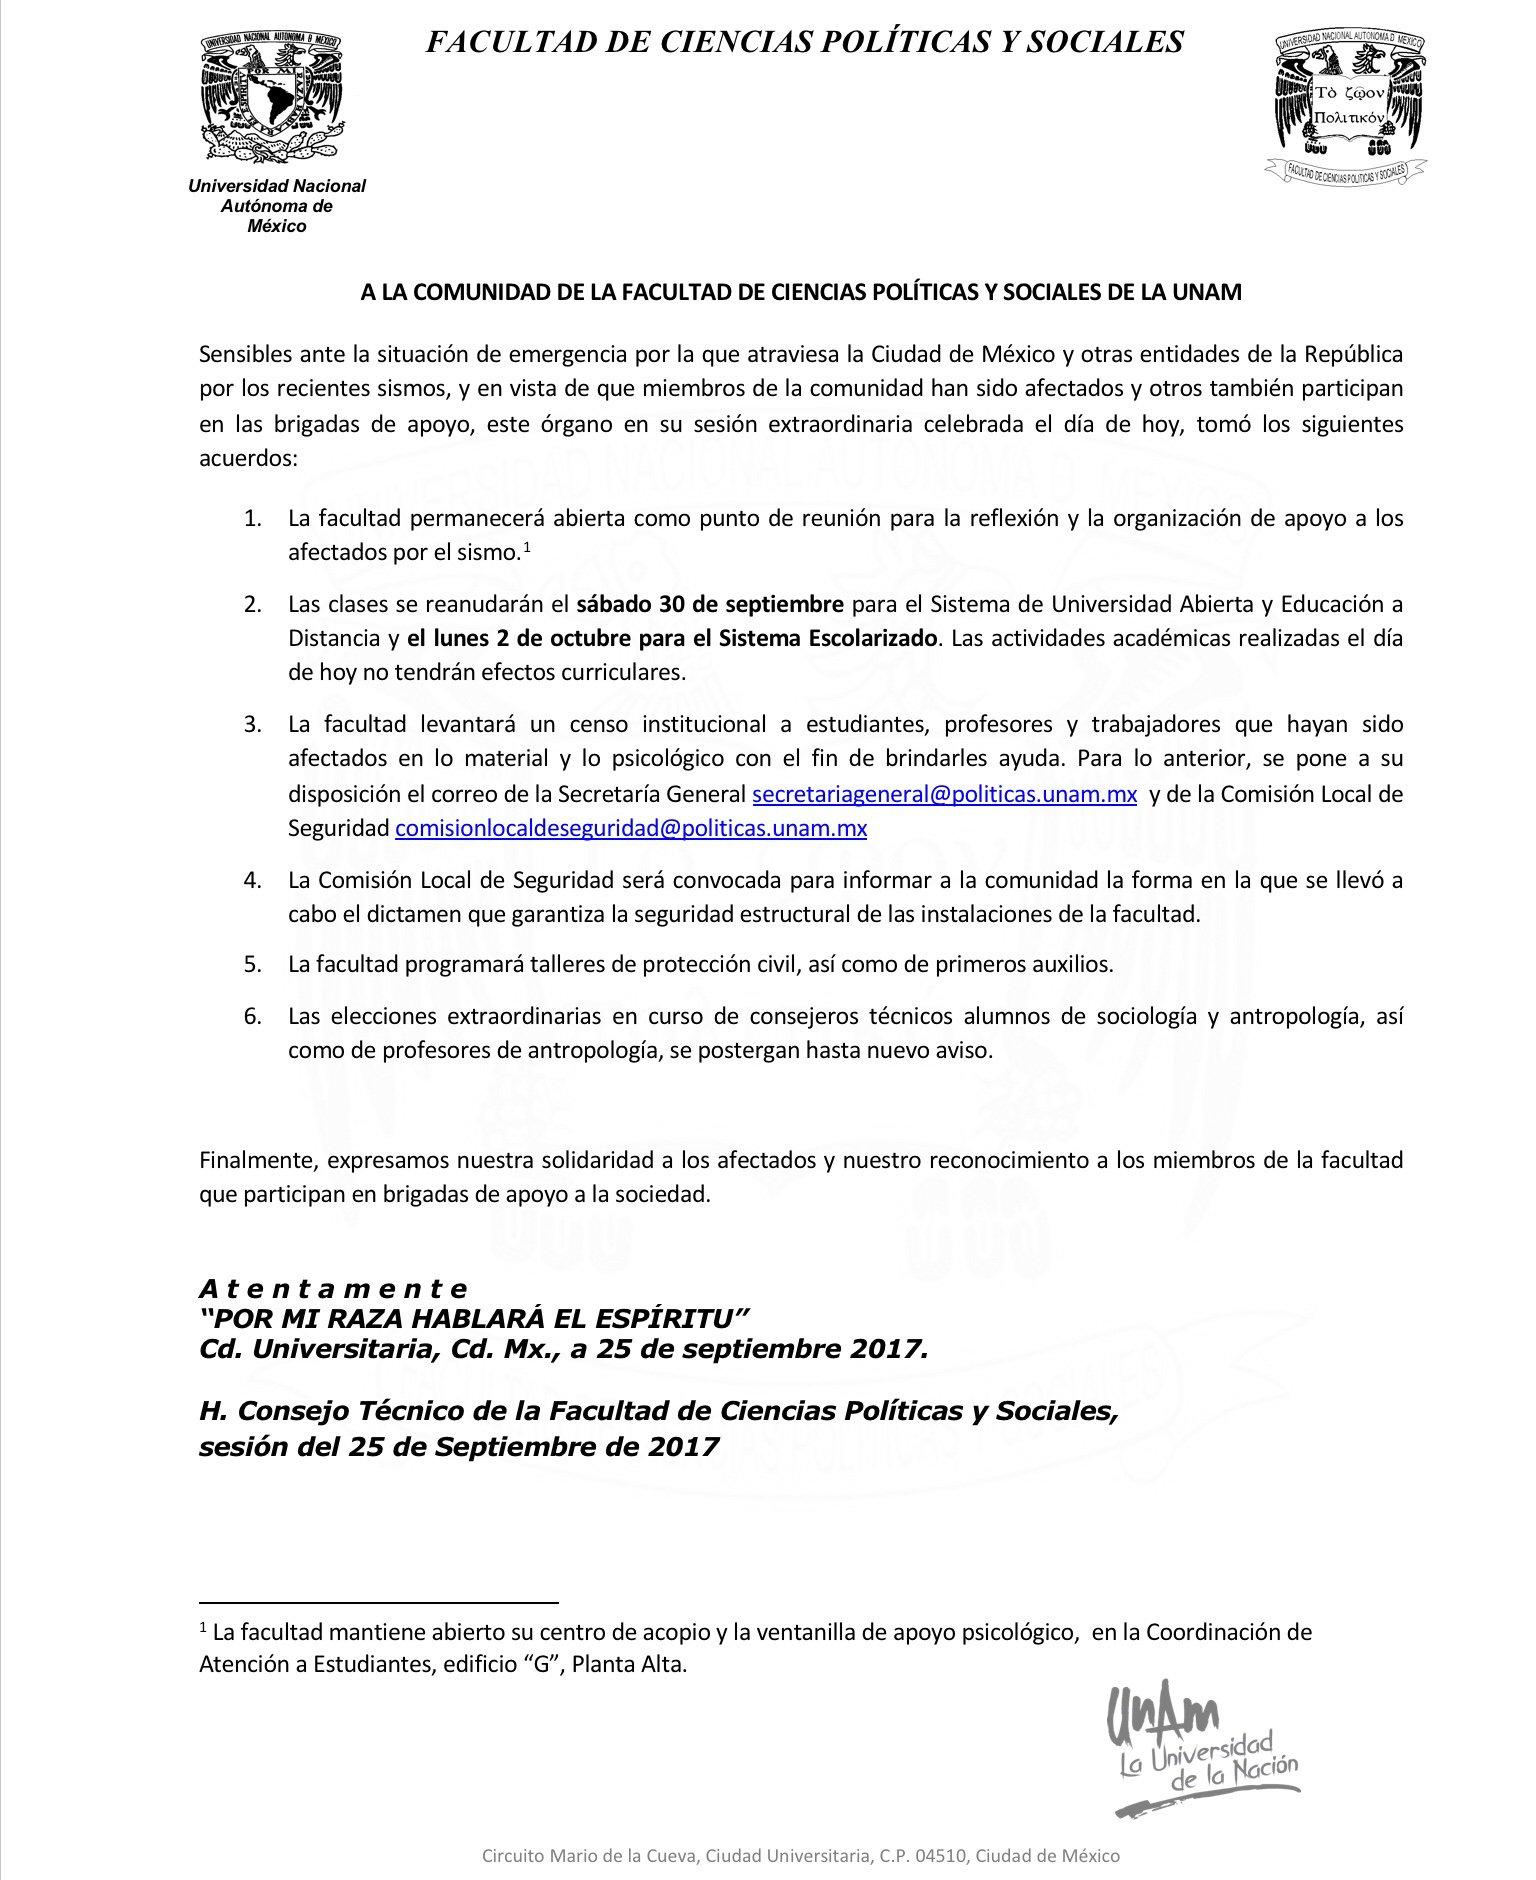 FCPyS-UNAM on Twitter: \